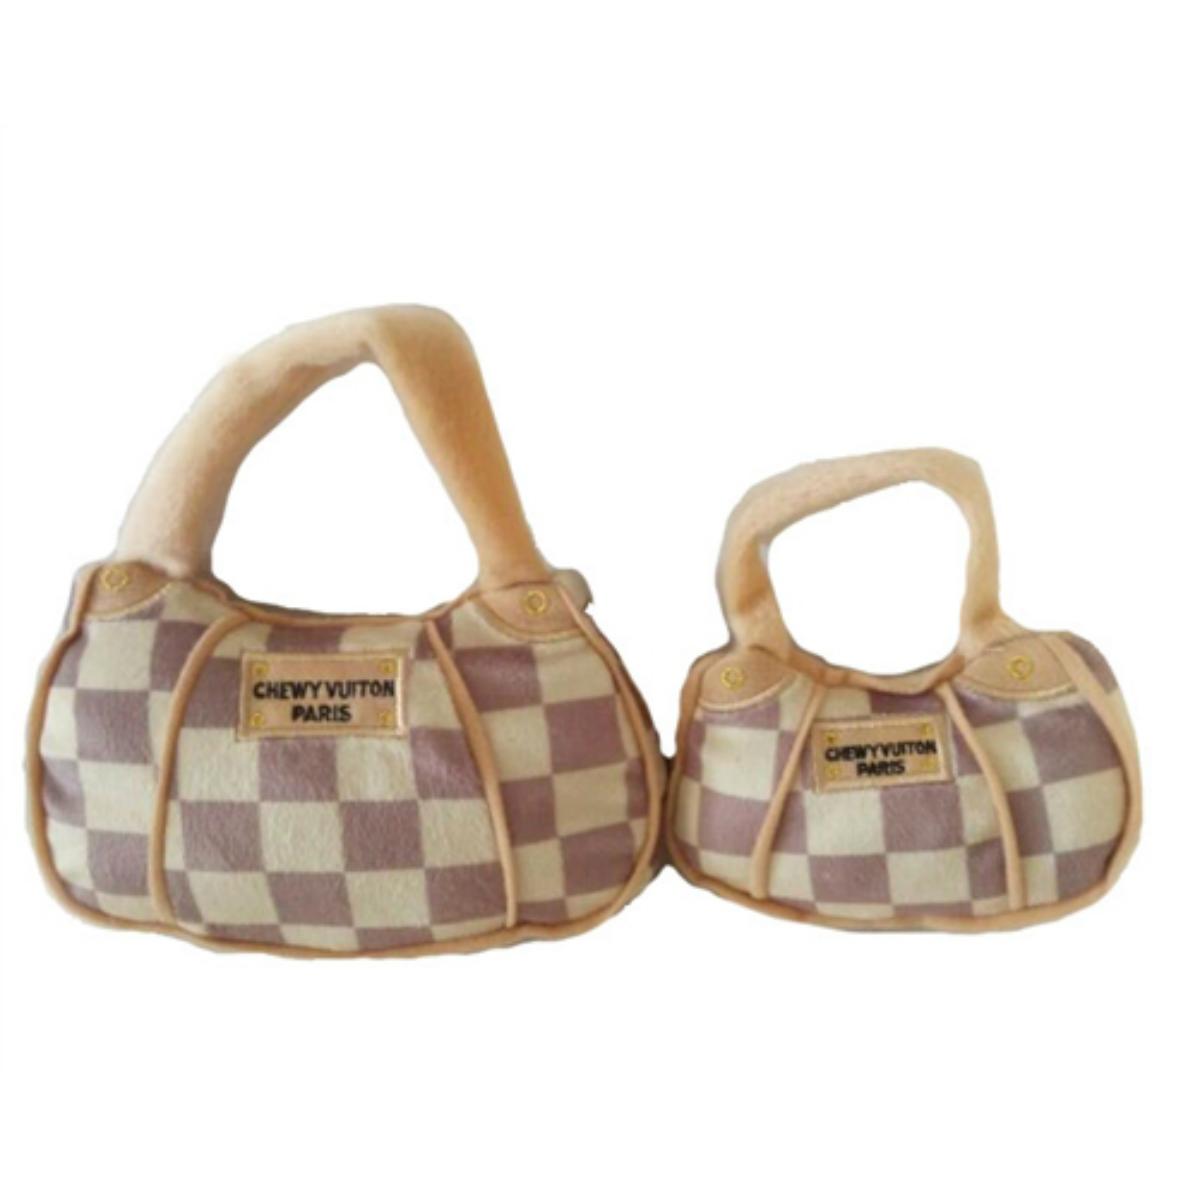 Checker Chewy Vuiton Handbag Plush Dog Toy